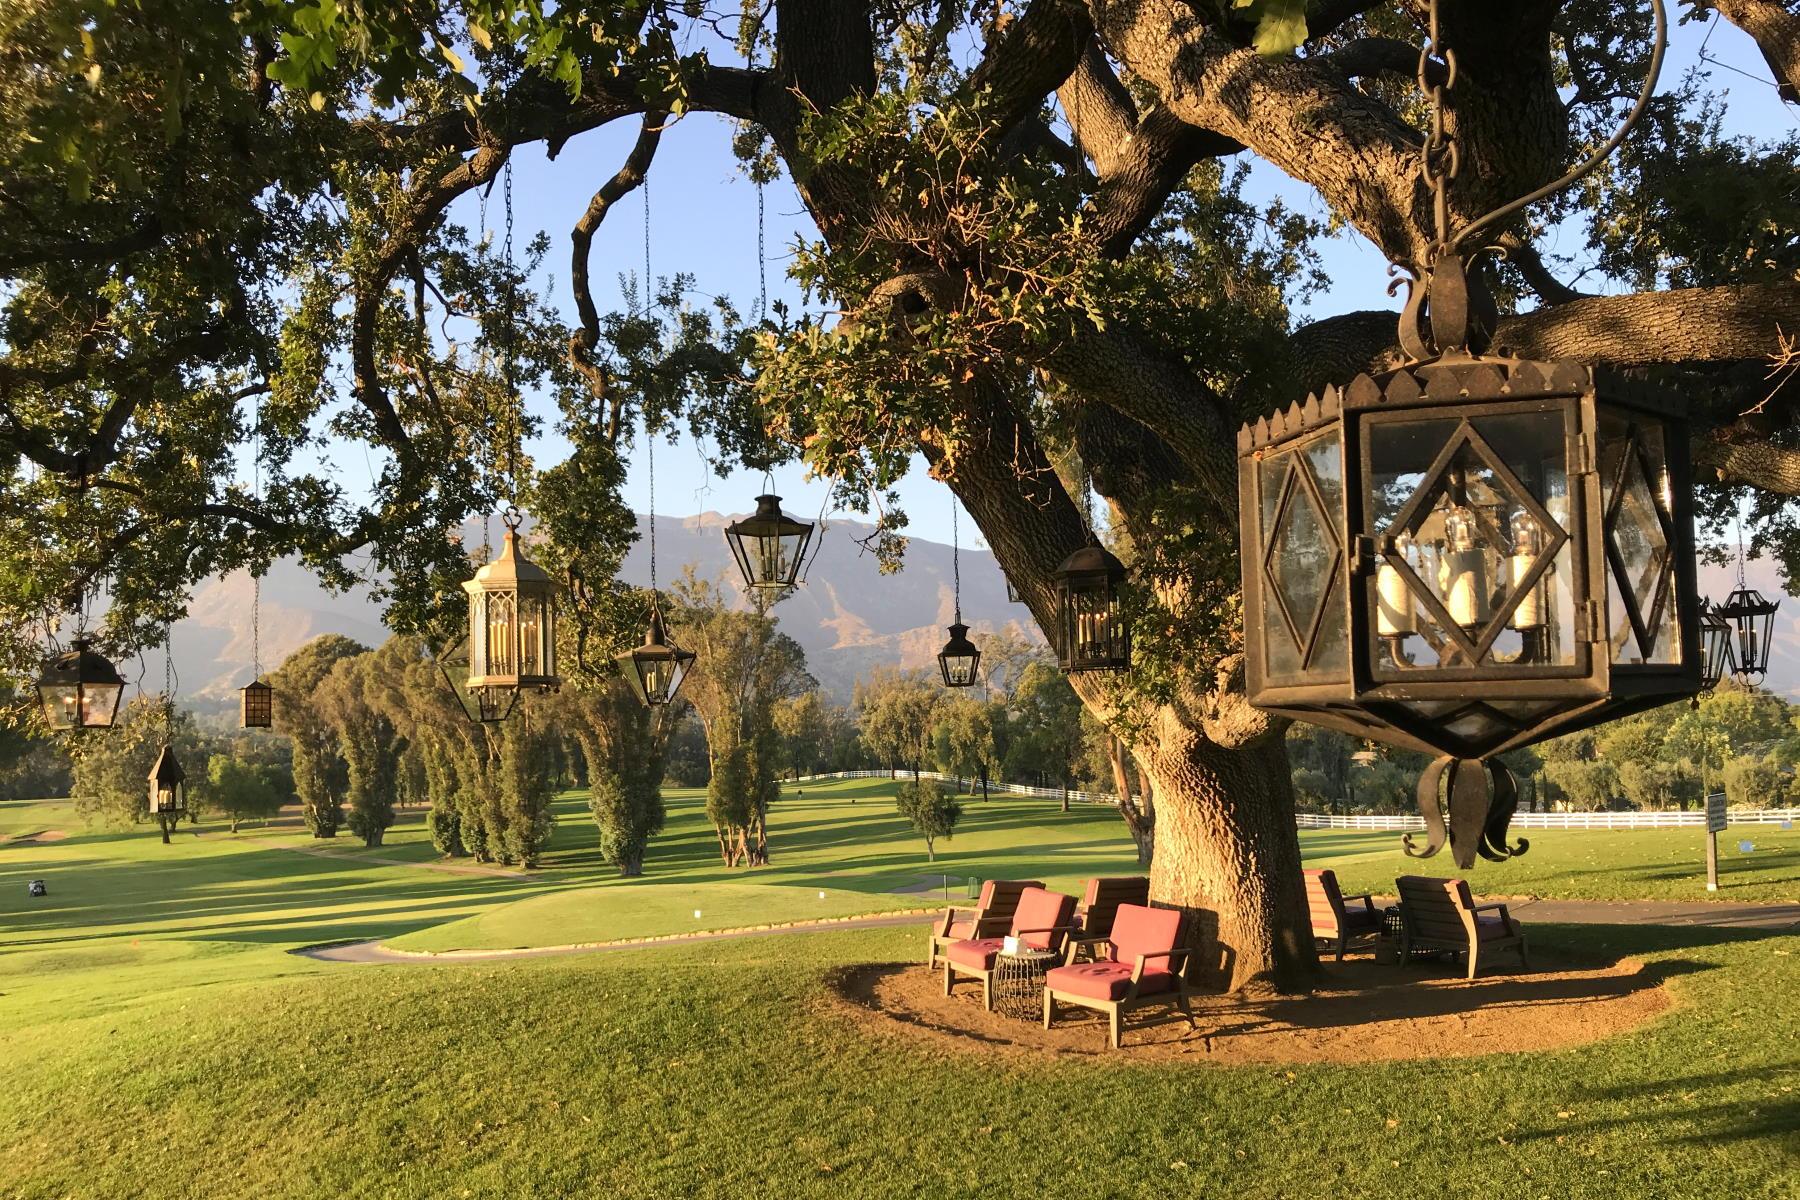 The Old Oak Tree at The Ojai Valley Inn